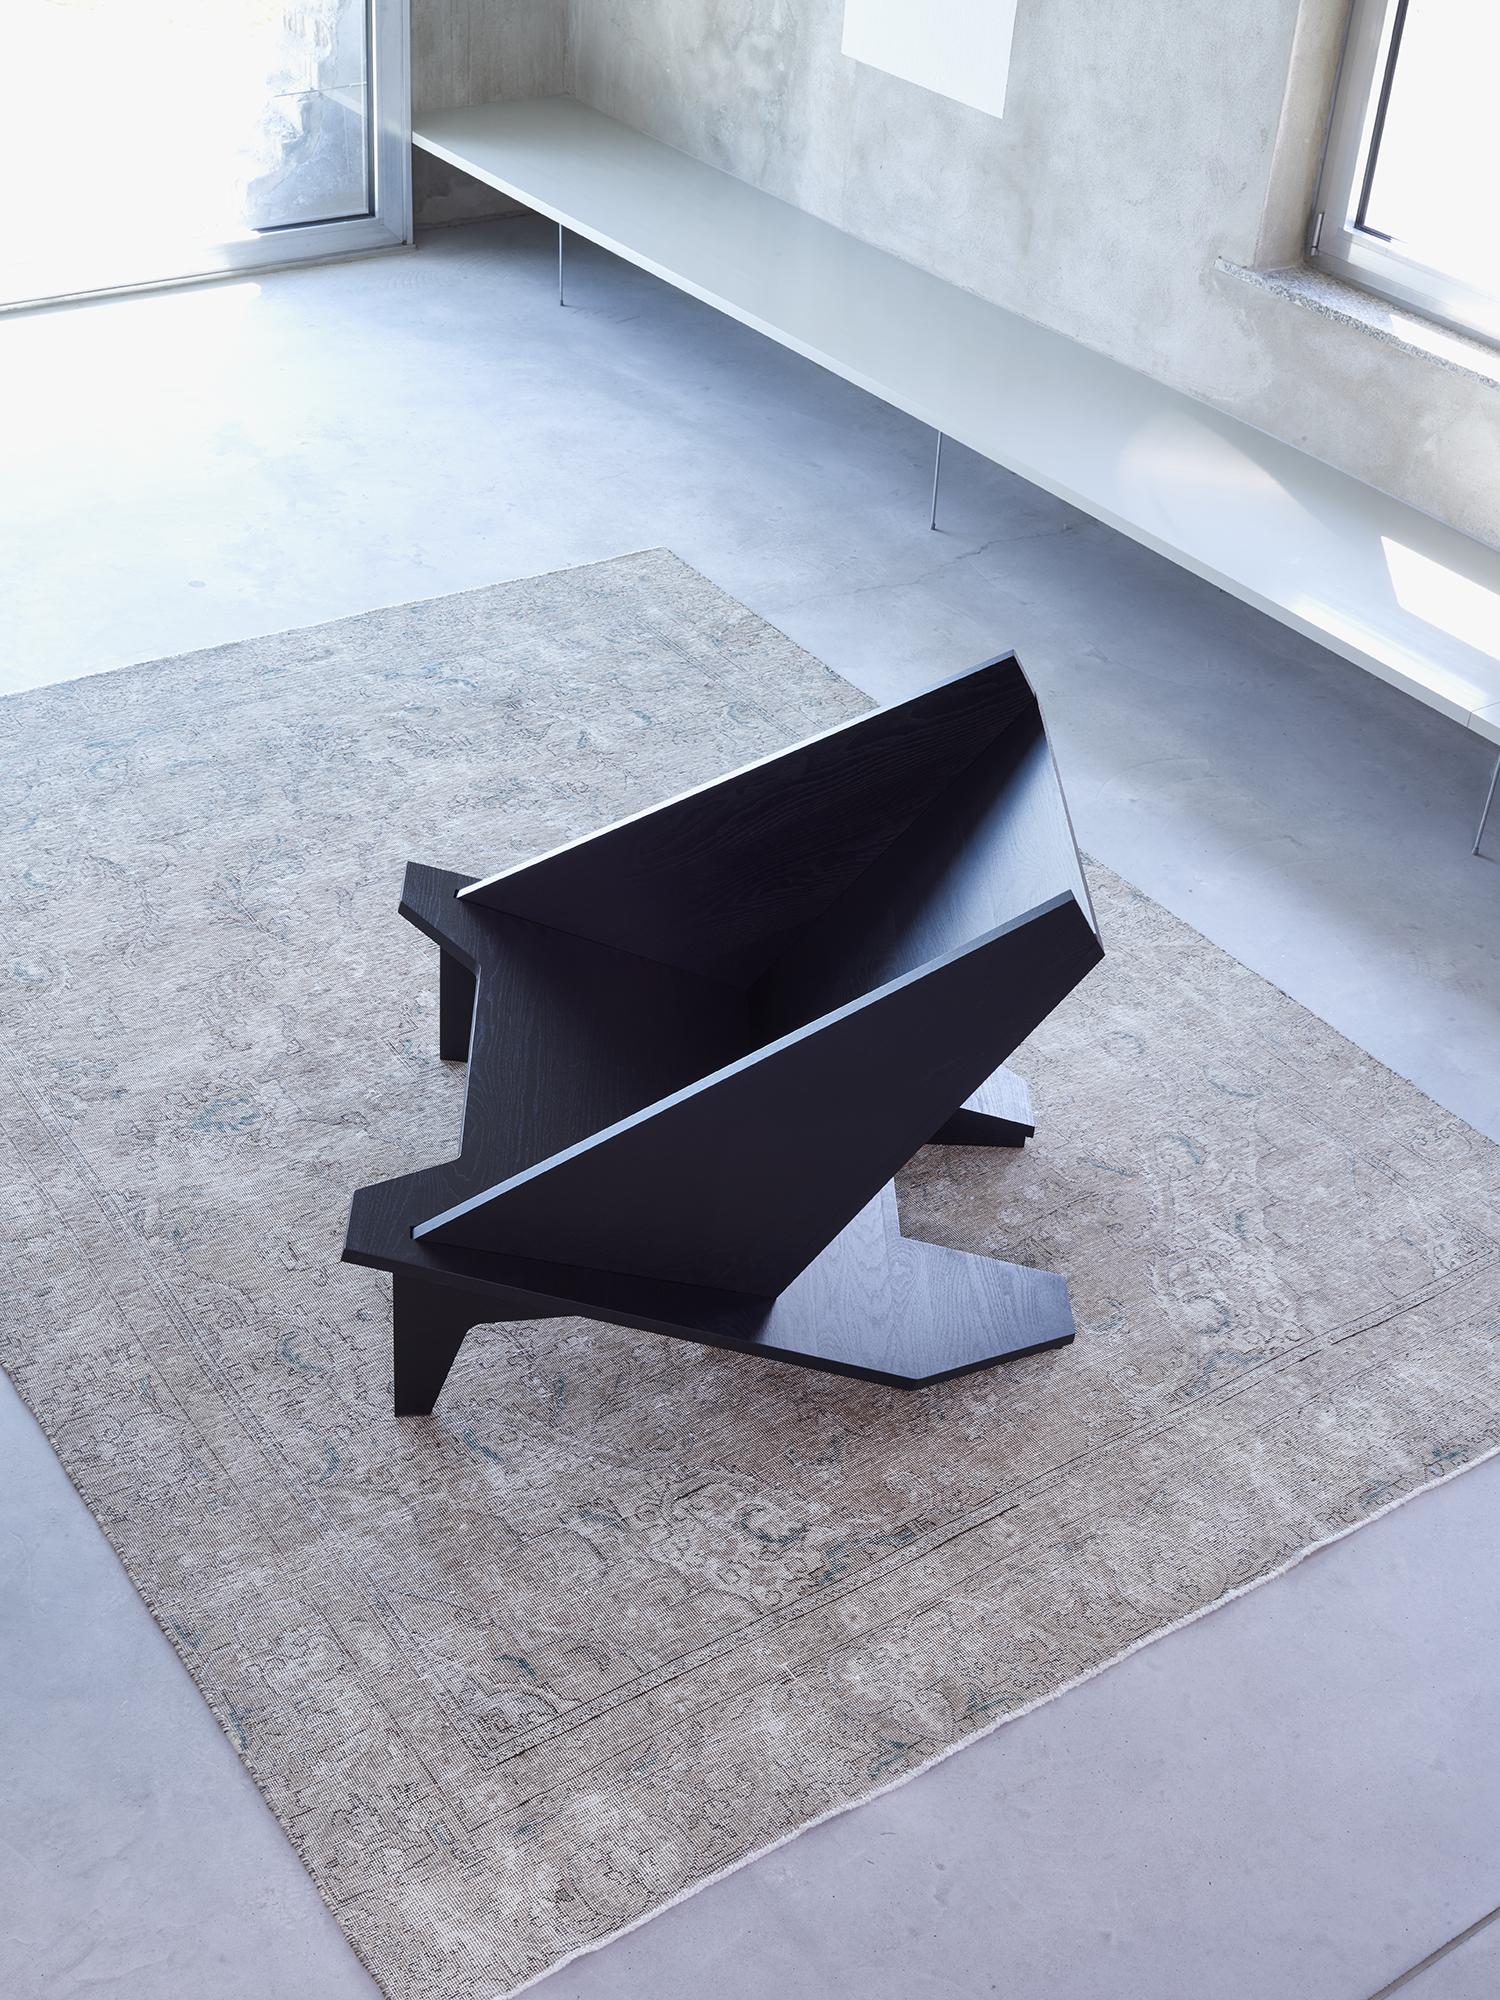 objekte-unserer-tage-3407-villa-16-takahashi-lounge-chair